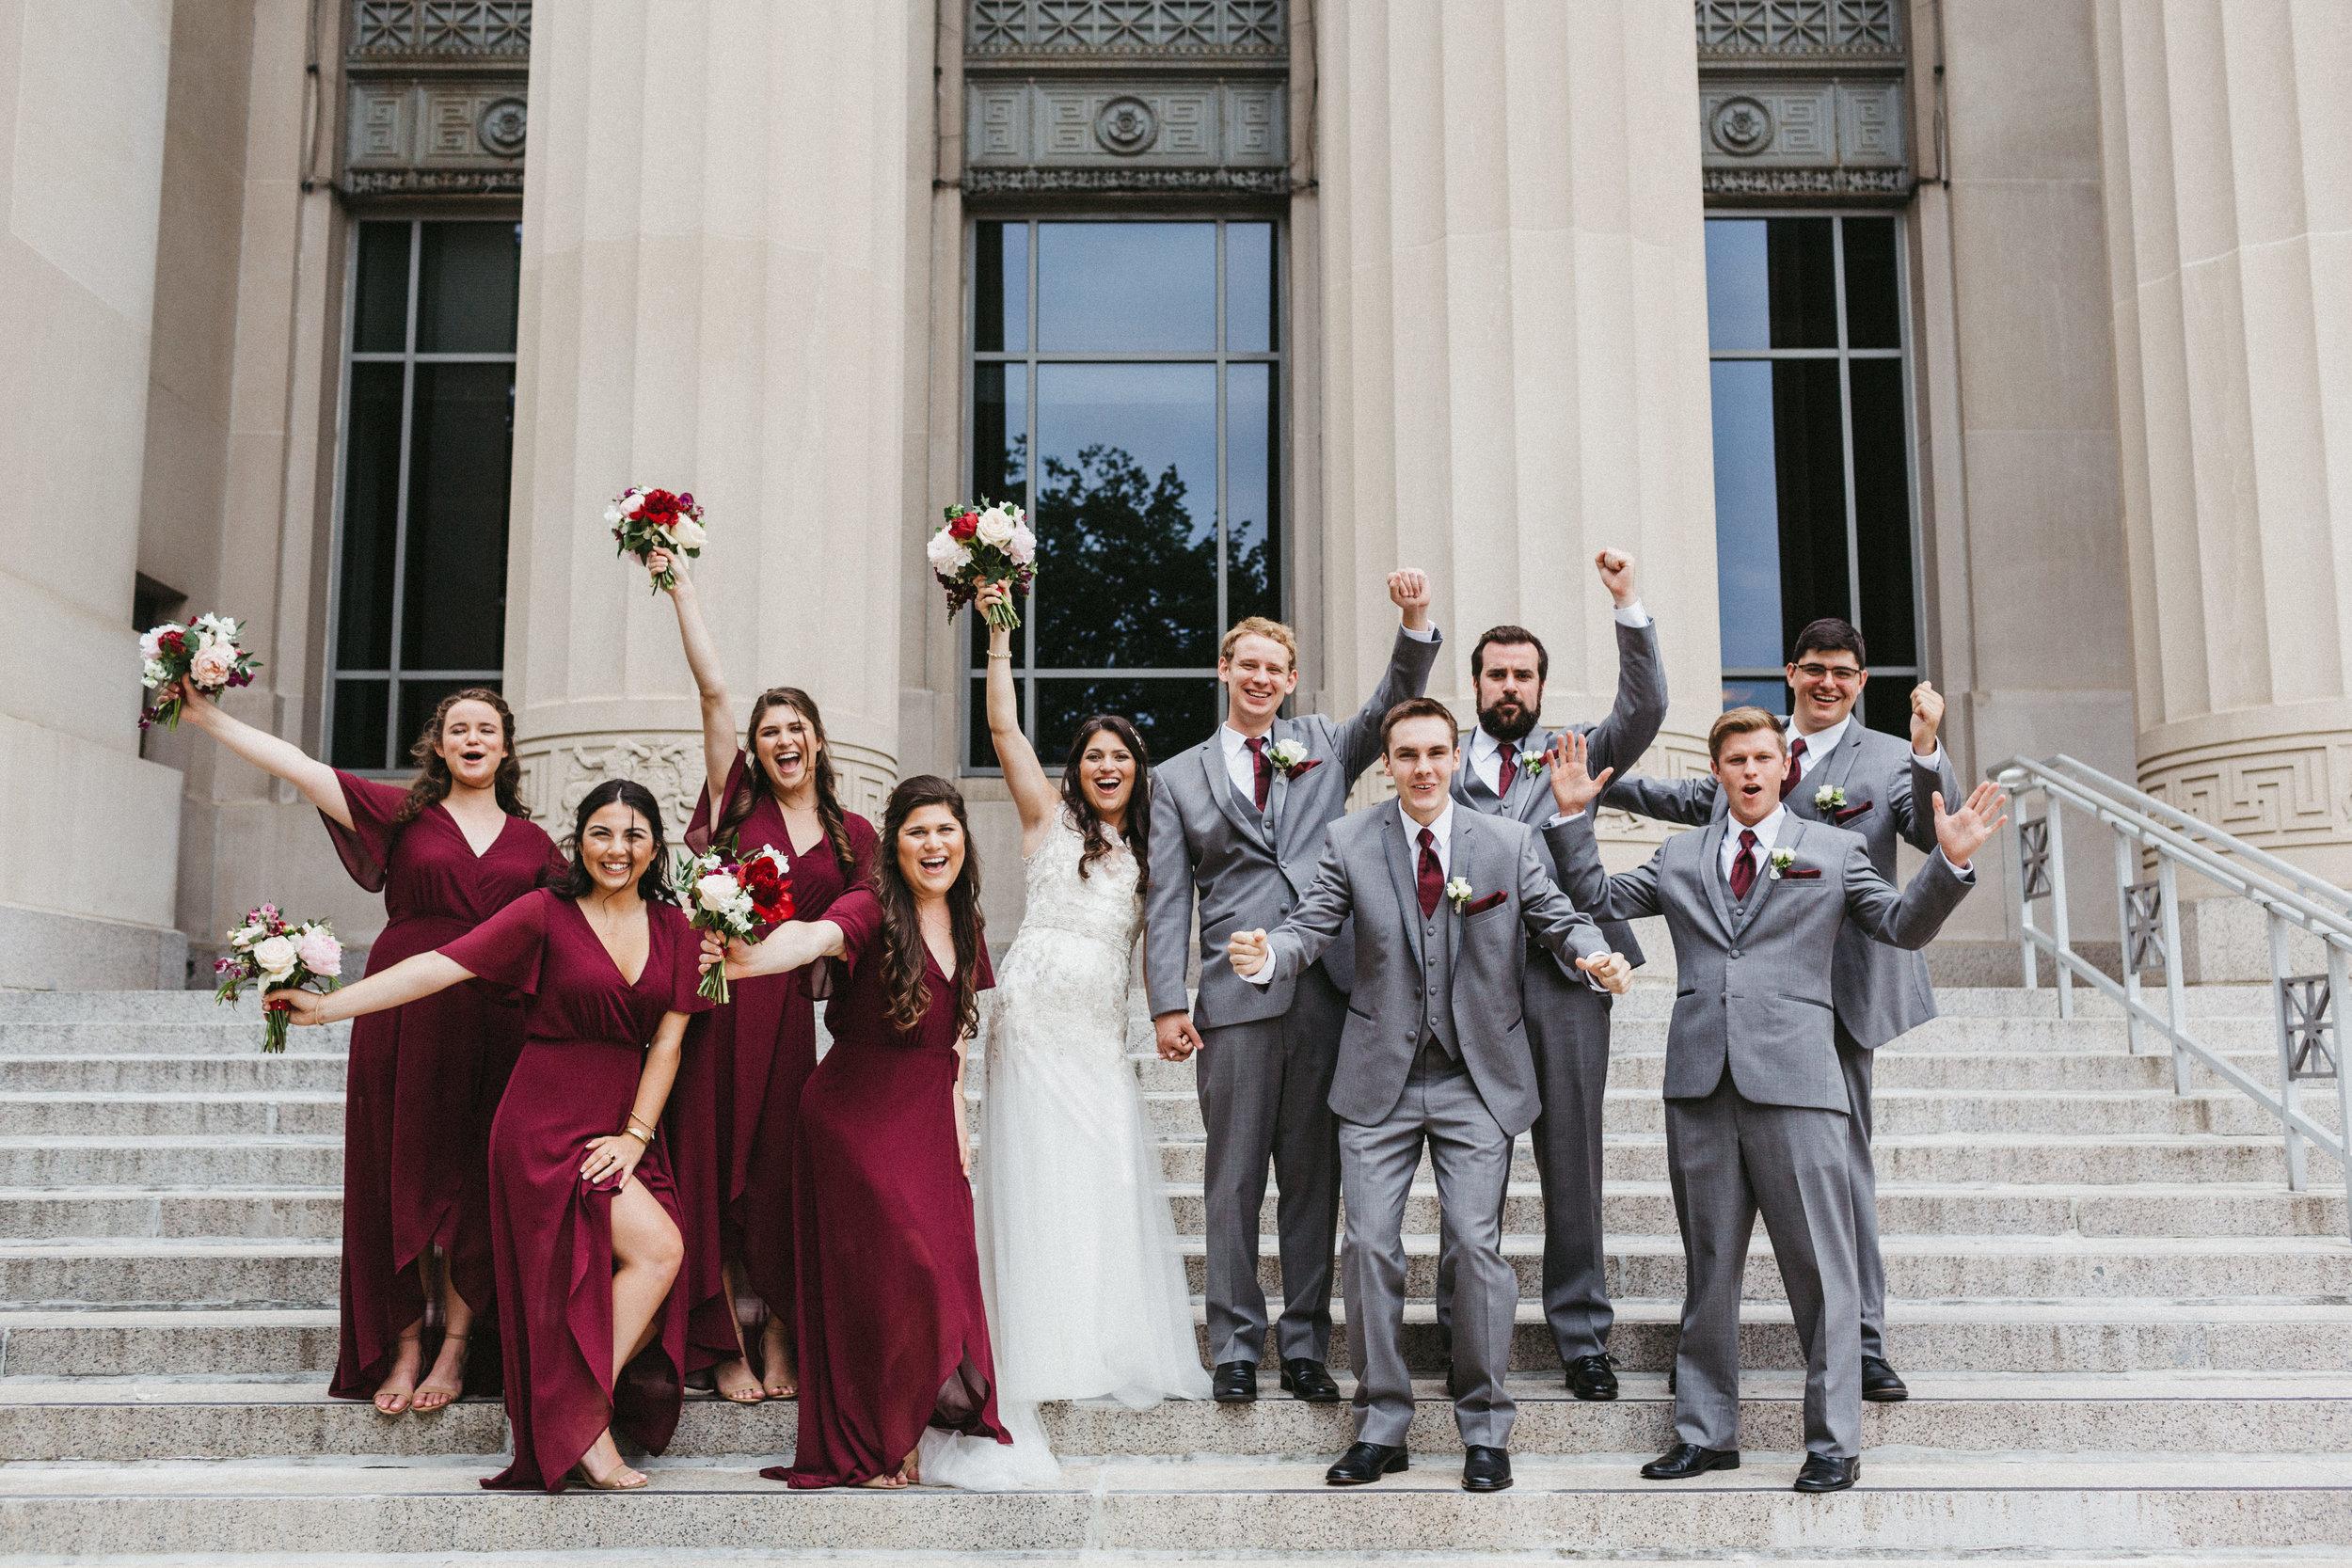 kelsey-connor-wedding-large-346.jpg